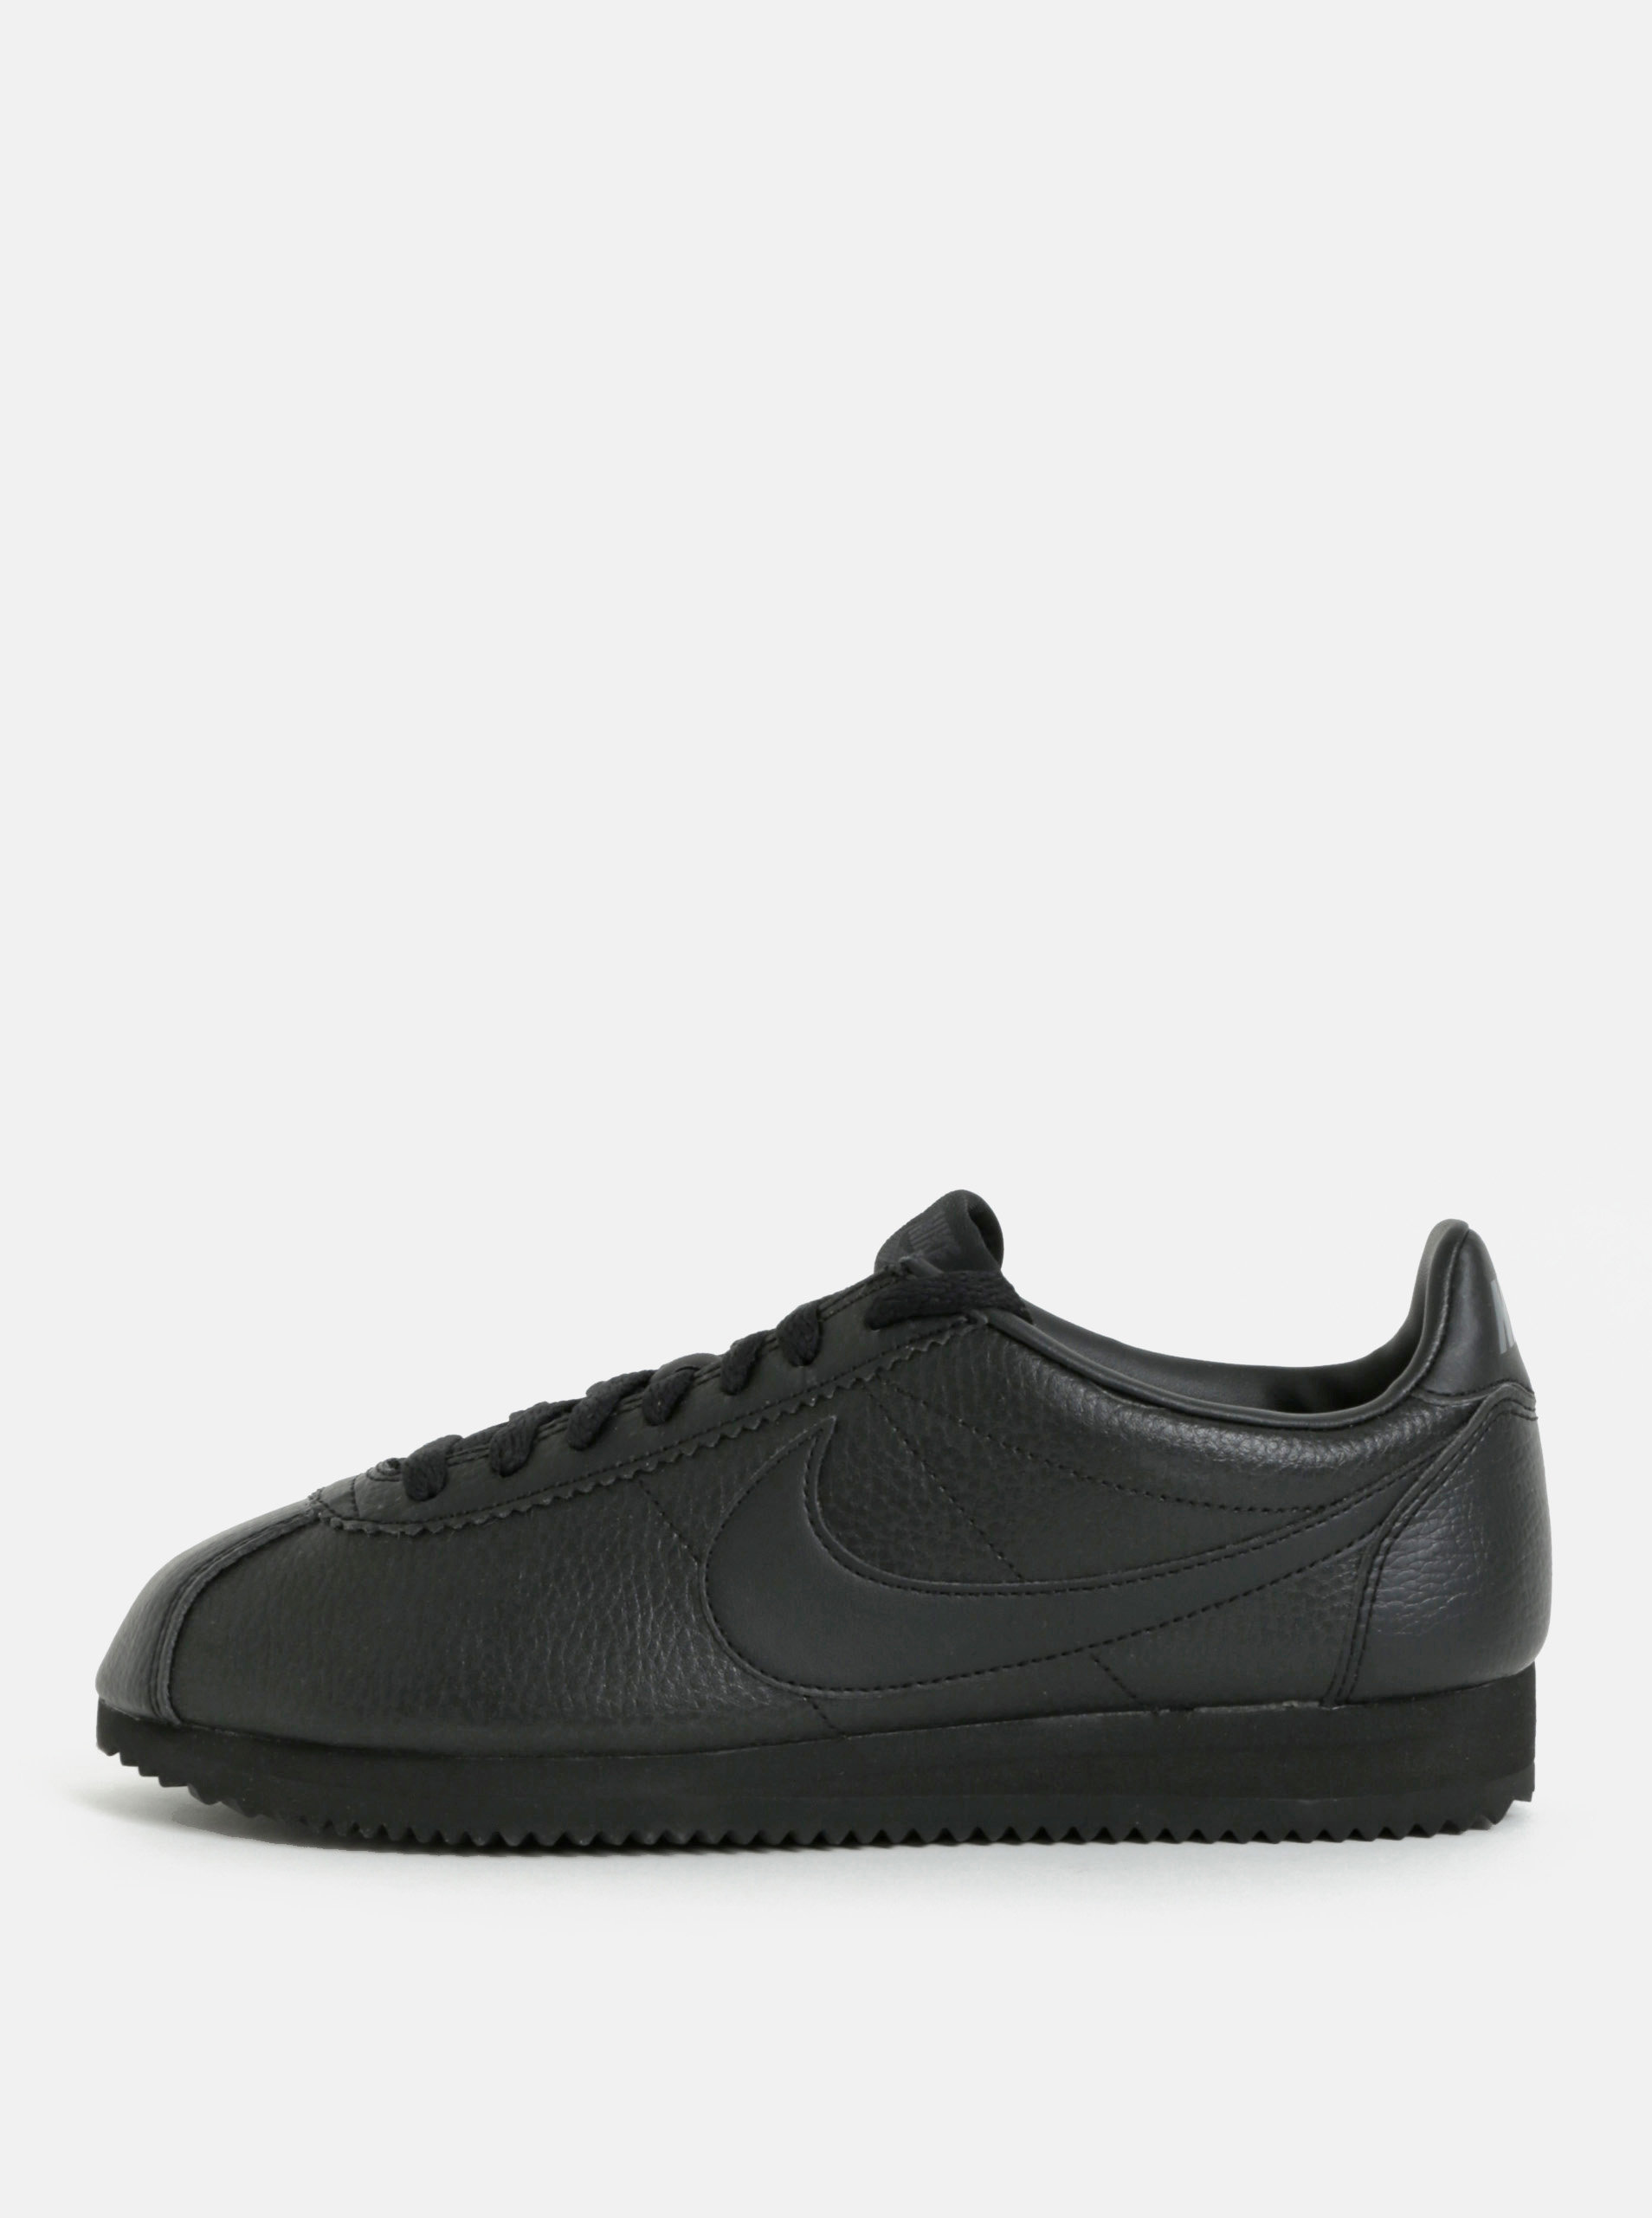 Čierne pánske kožené tenisky Nike Classic Leather ... ea9055d8b6c